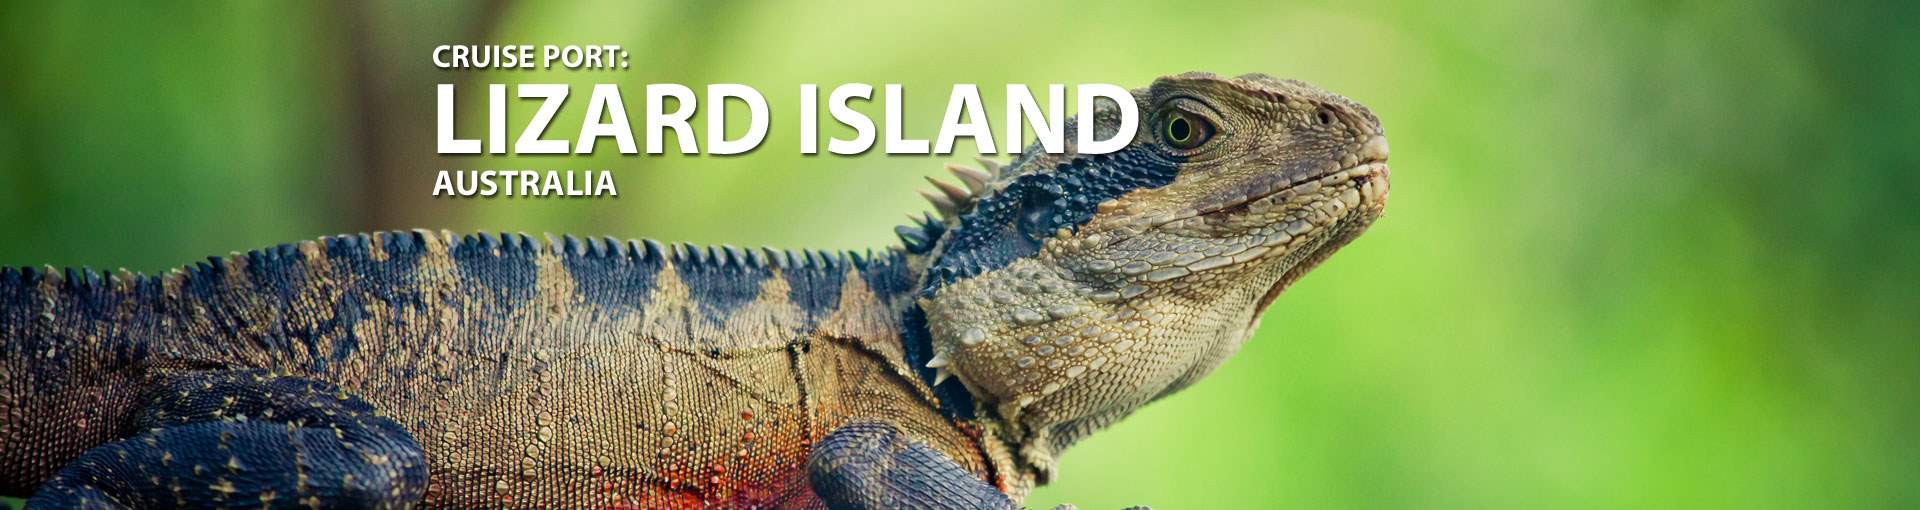 Cruises to Lizard Island, Australia